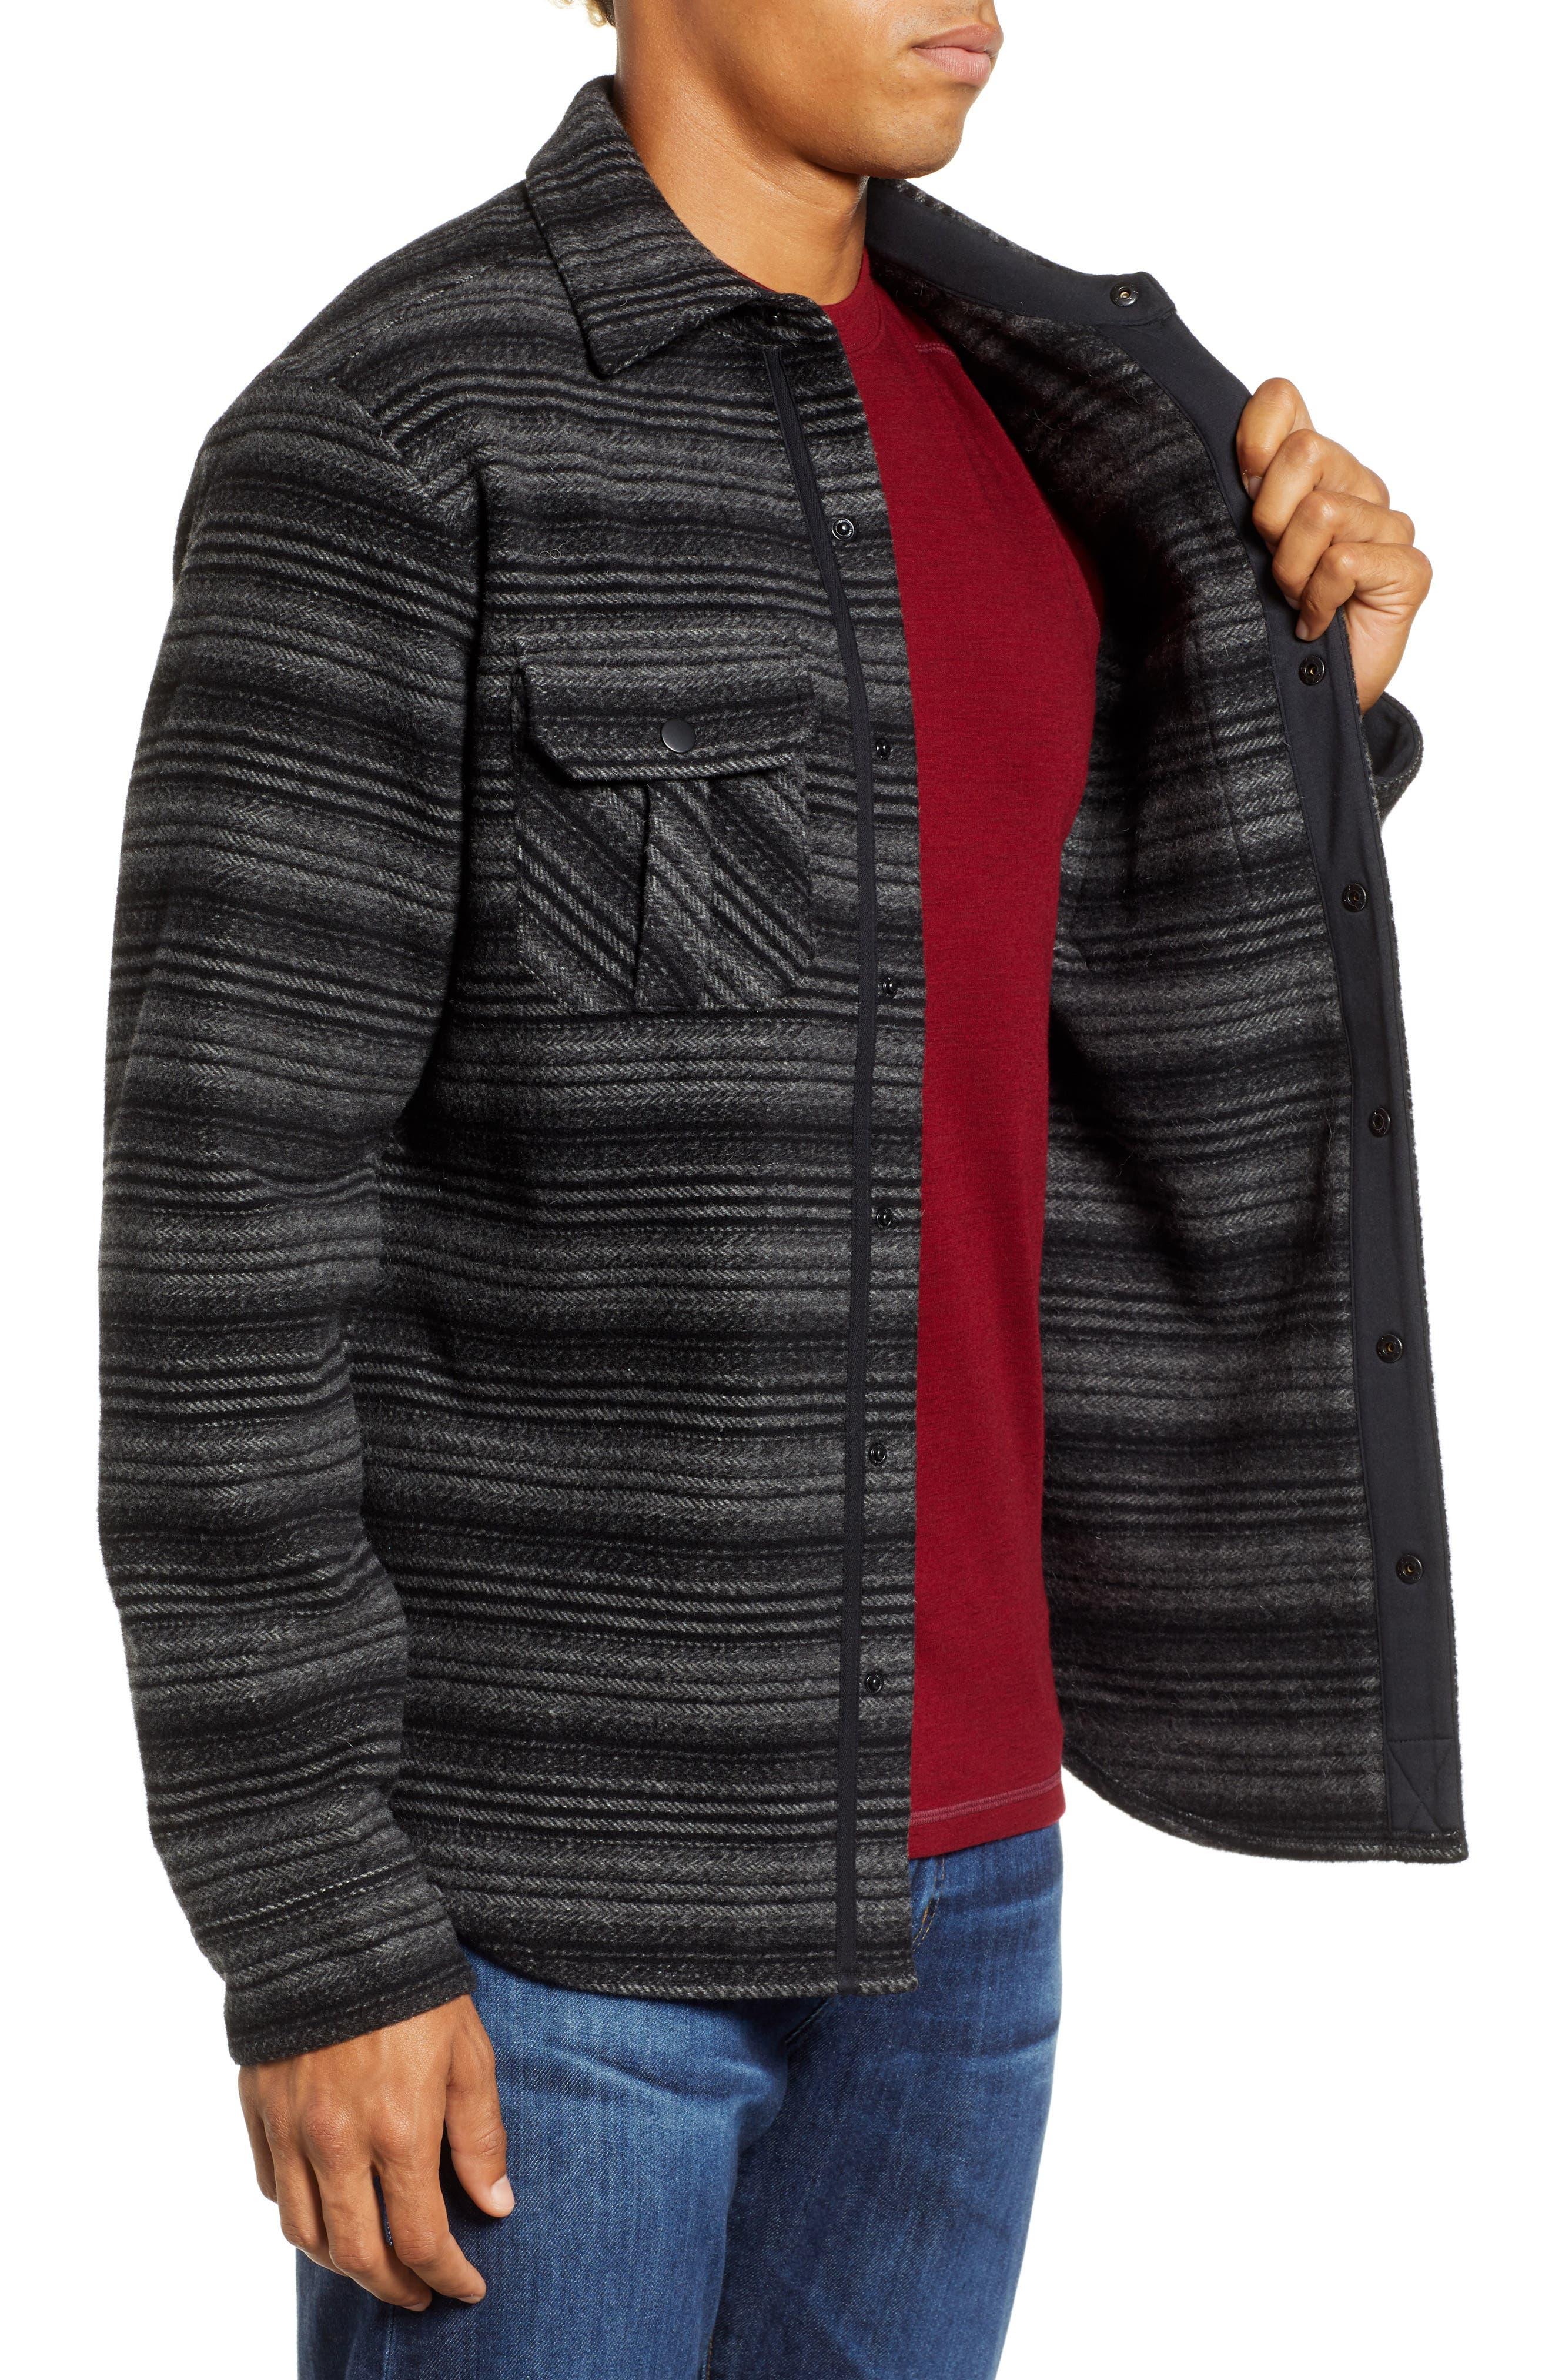 Anchor Line Flannel Shirt Jacket,                             Alternate thumbnail 4, color,                             MEDIUM GREY/ BLACK